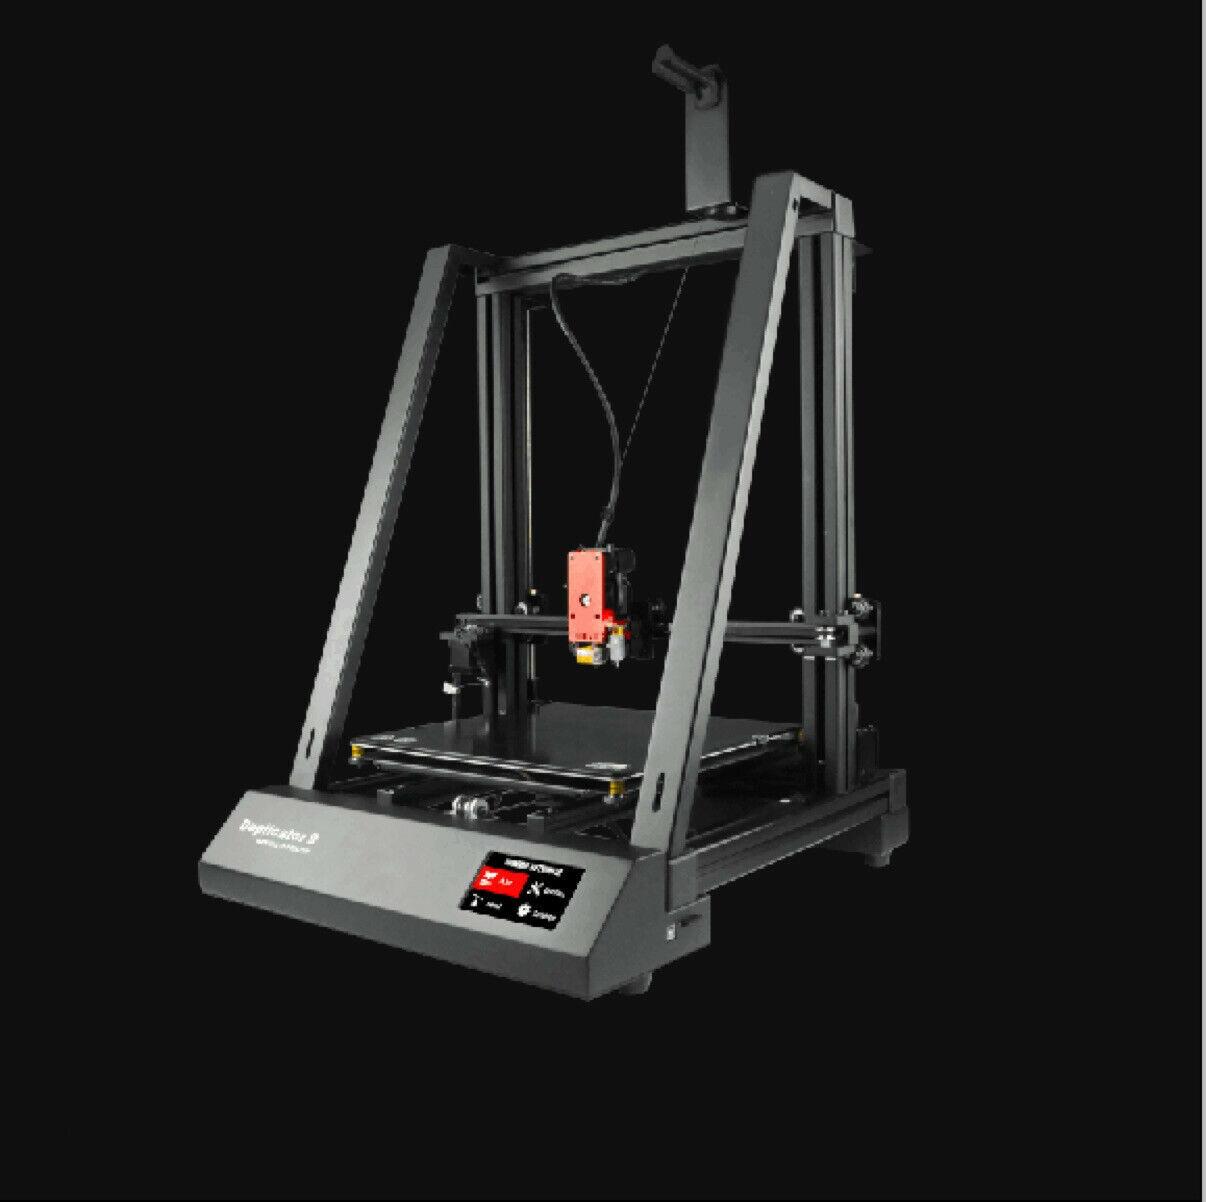 Wanhao D9 MK 2 (500) 3D Drucker Duplizierer 9 Mark 2 II Druckgröße 500mm